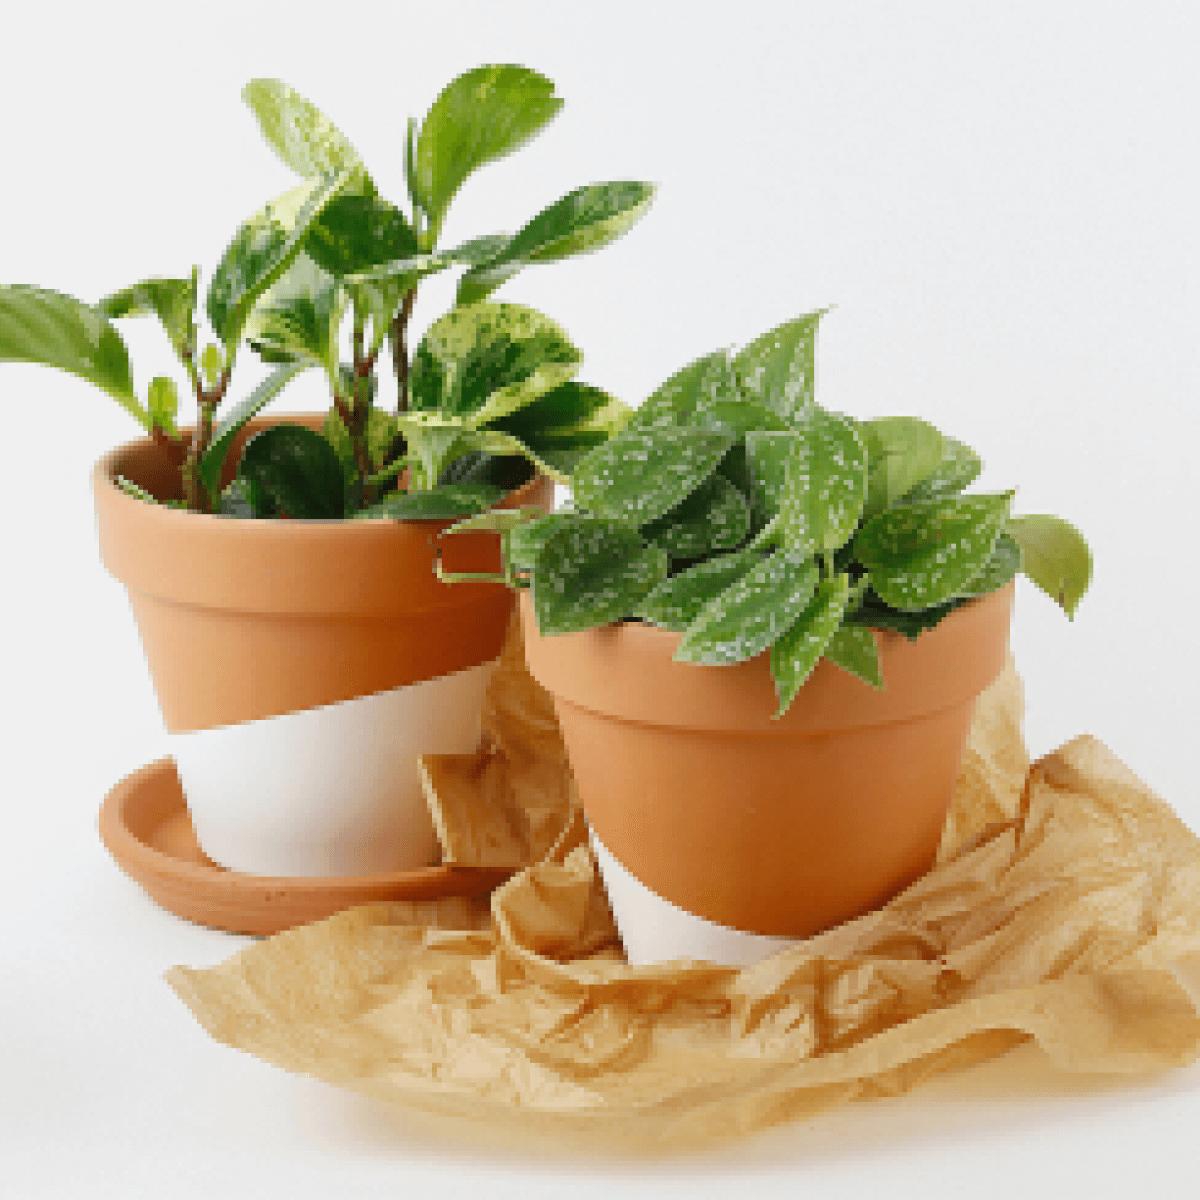 Horti Hard-to-kill plant club.